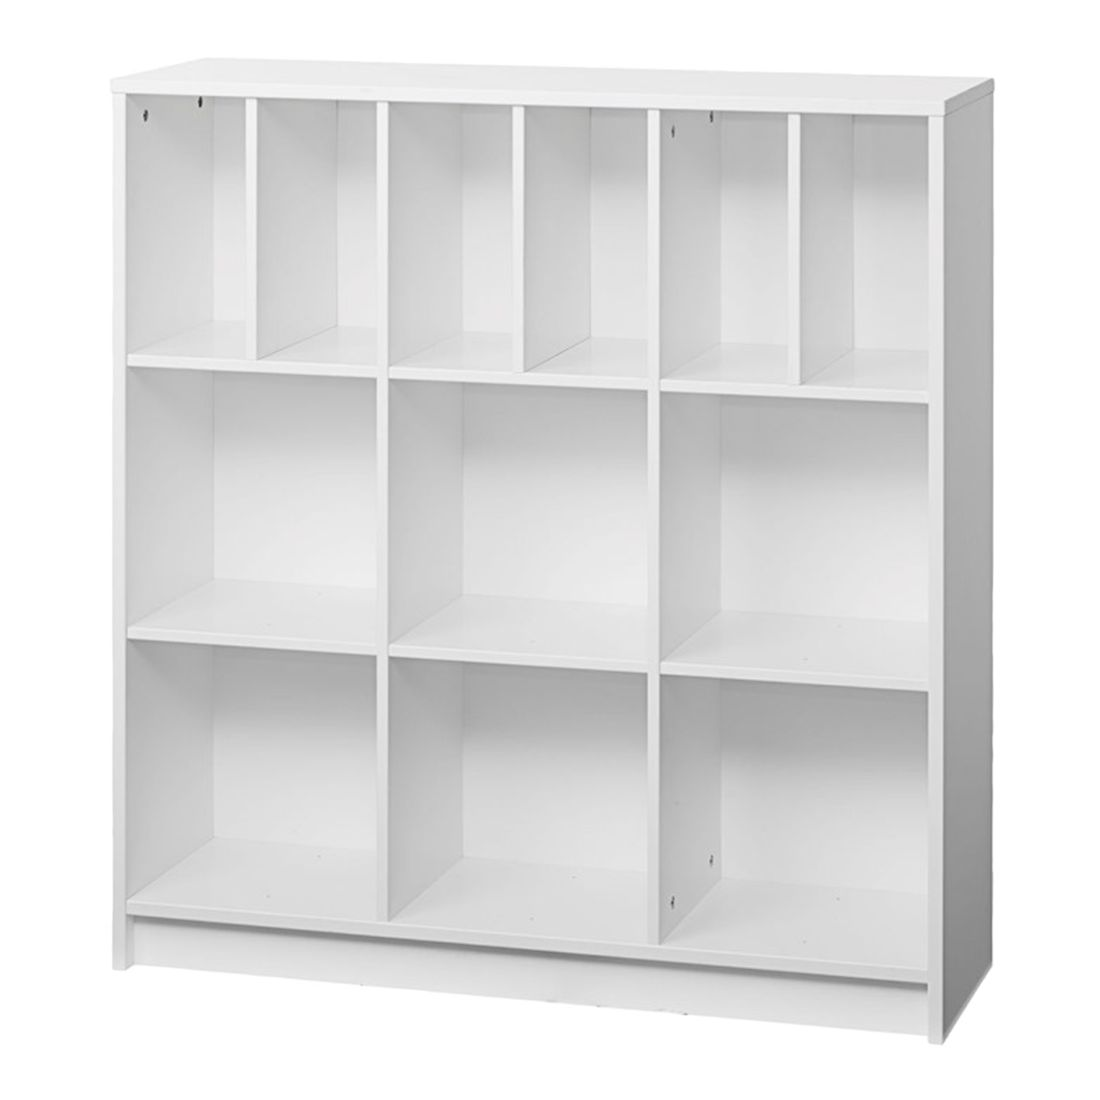 Bücherregal Combee II – Weiß, Kids Club Collection online bestellen